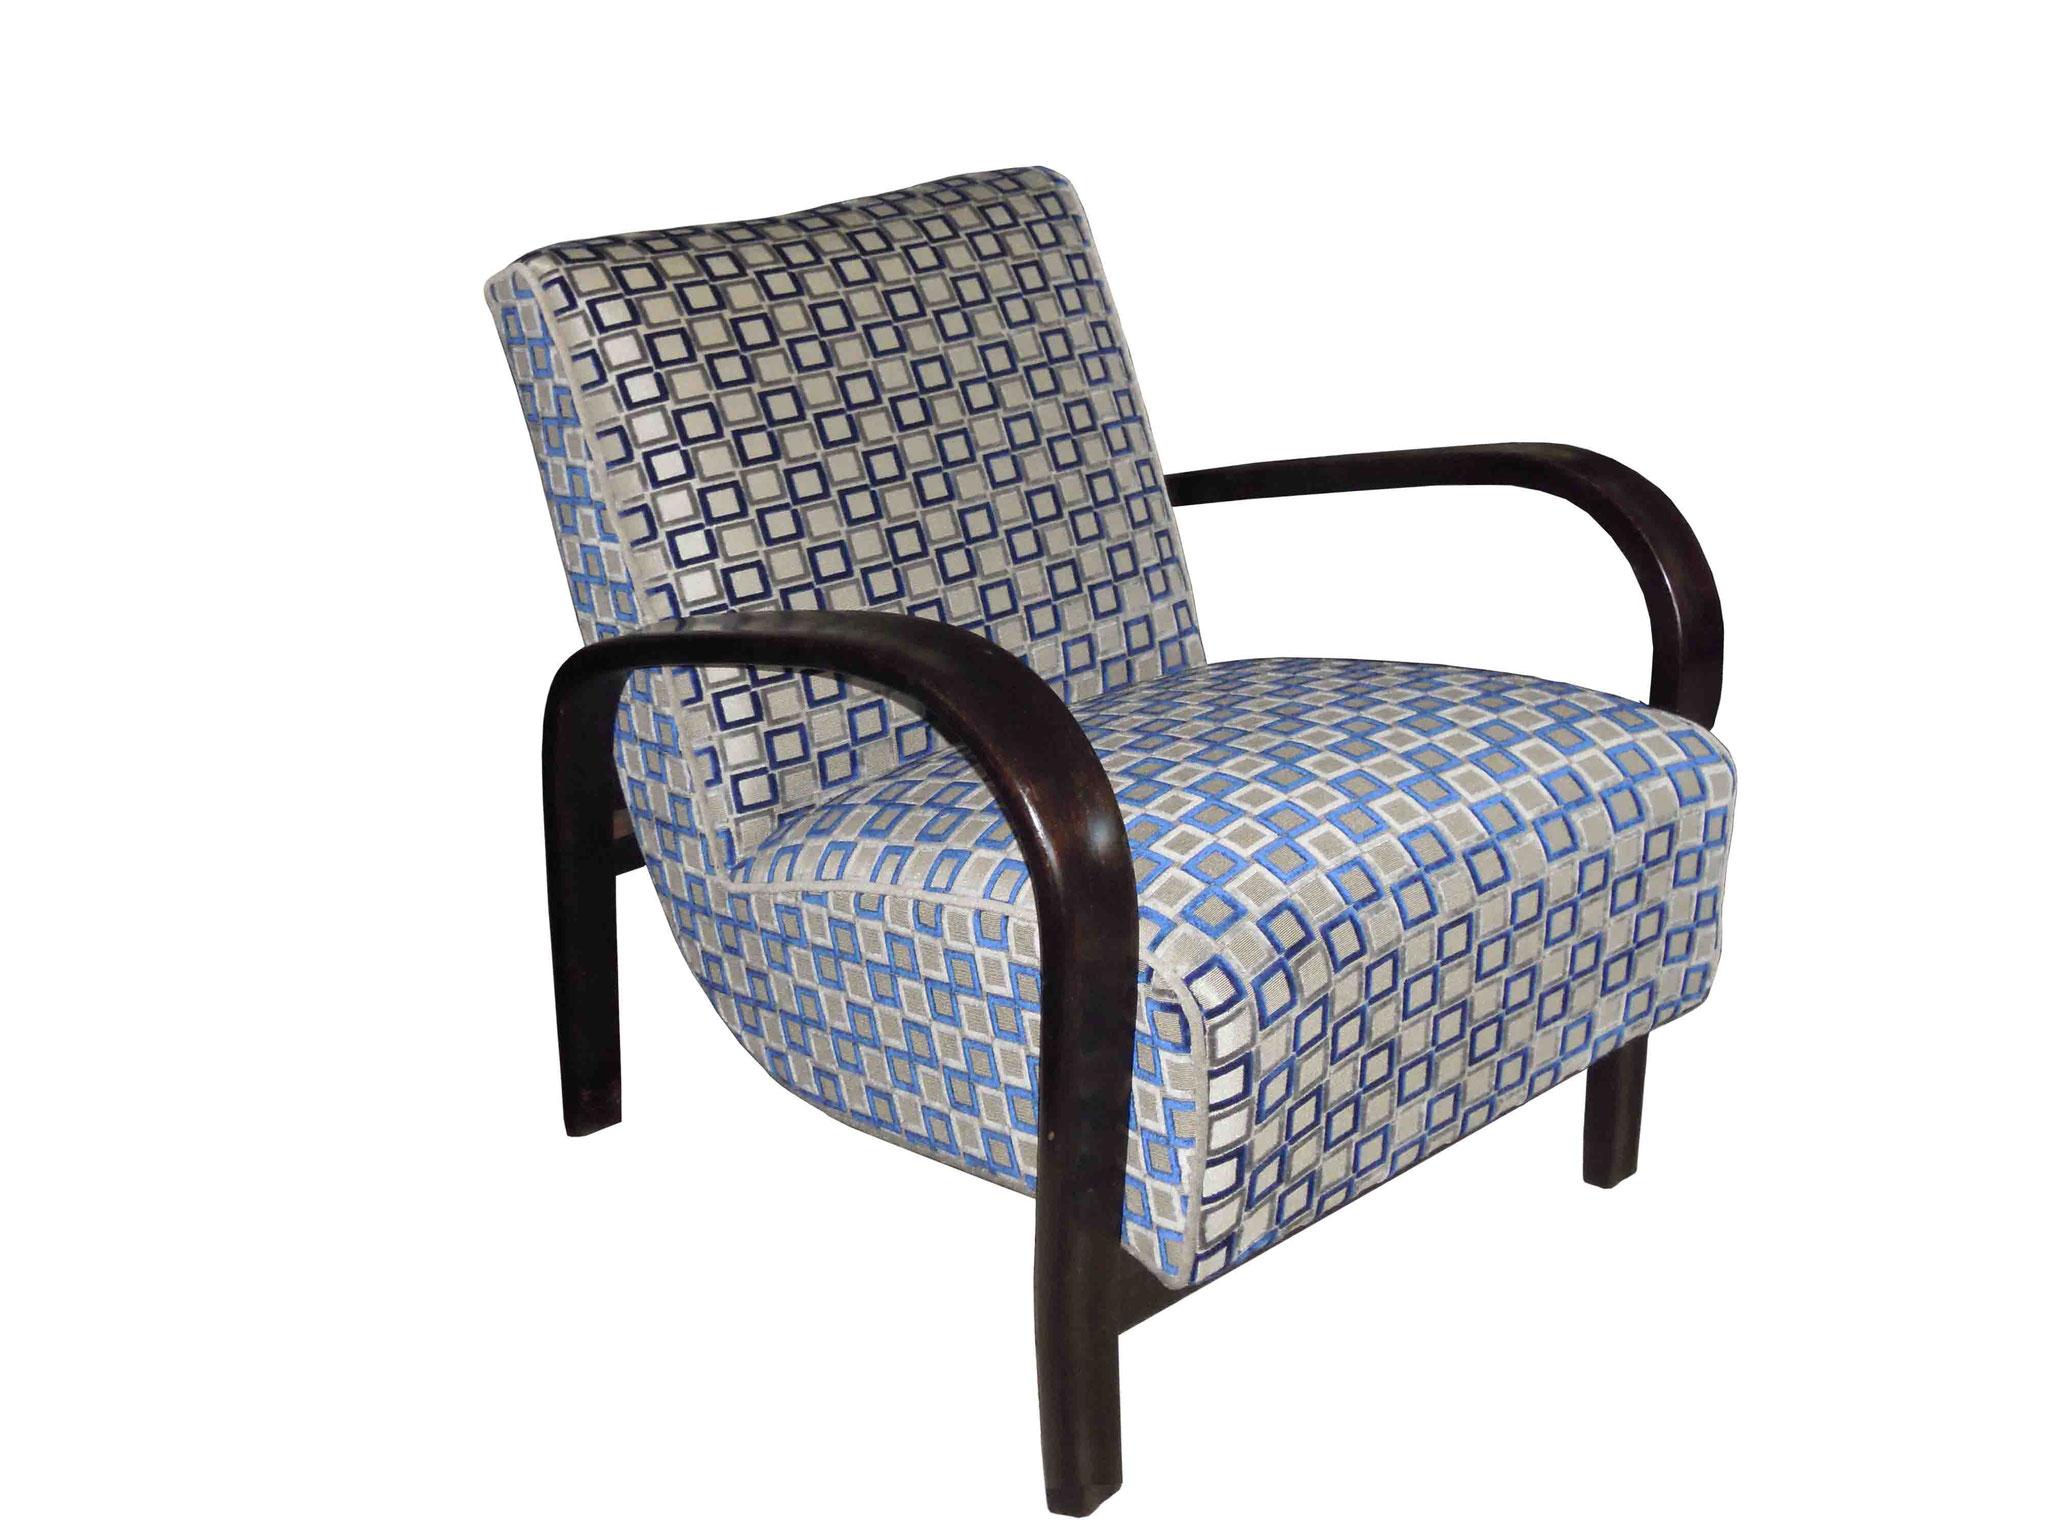 artdeco bentwood chair 1940s